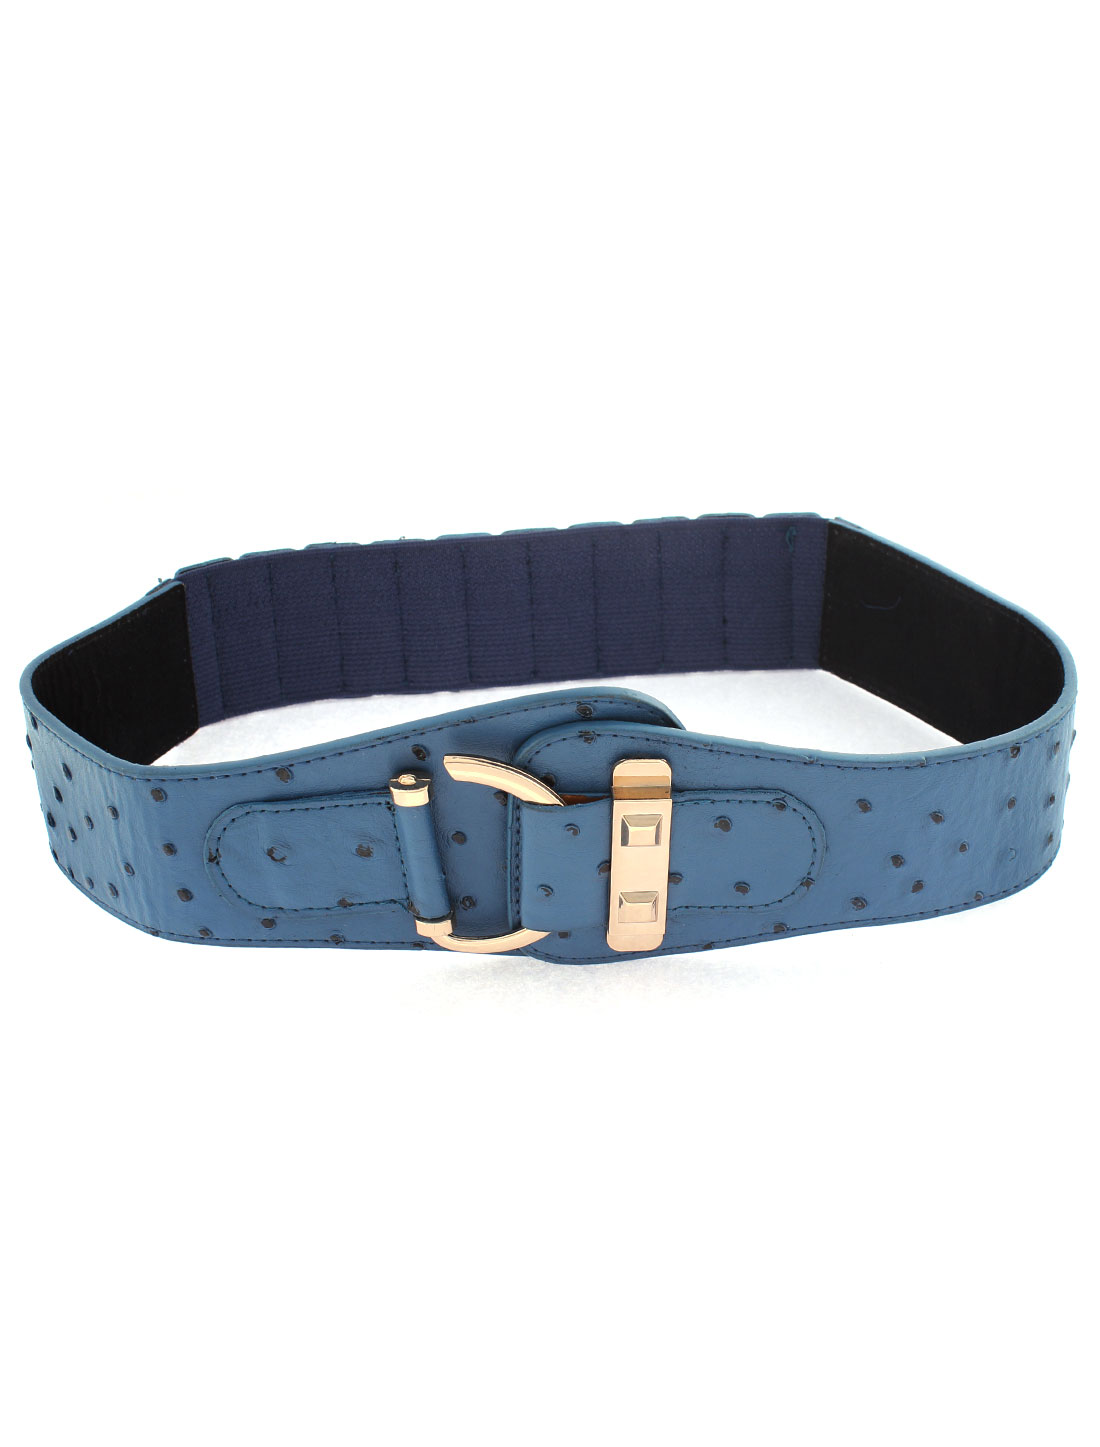 Lady D Shape Metal Hook Buckle Stretchy Waist Belt Cinch Waistband Teal Blue